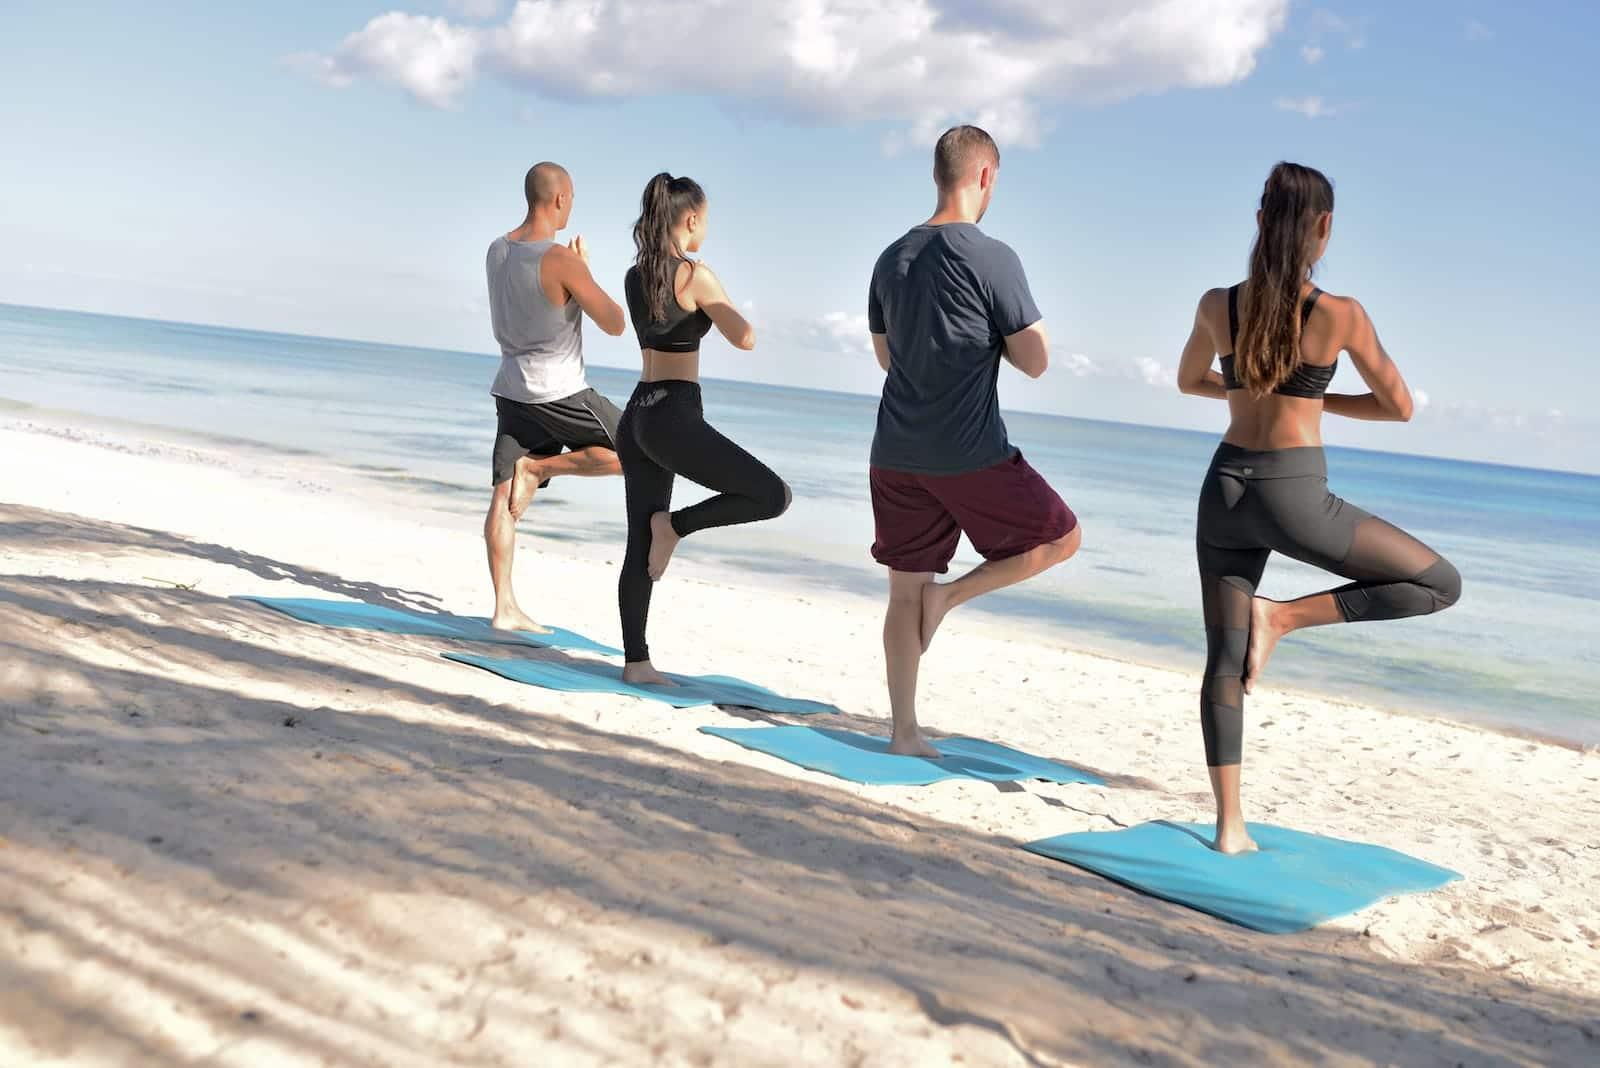 Beach yoga adventure all inclusive resort mexico romantic vacation